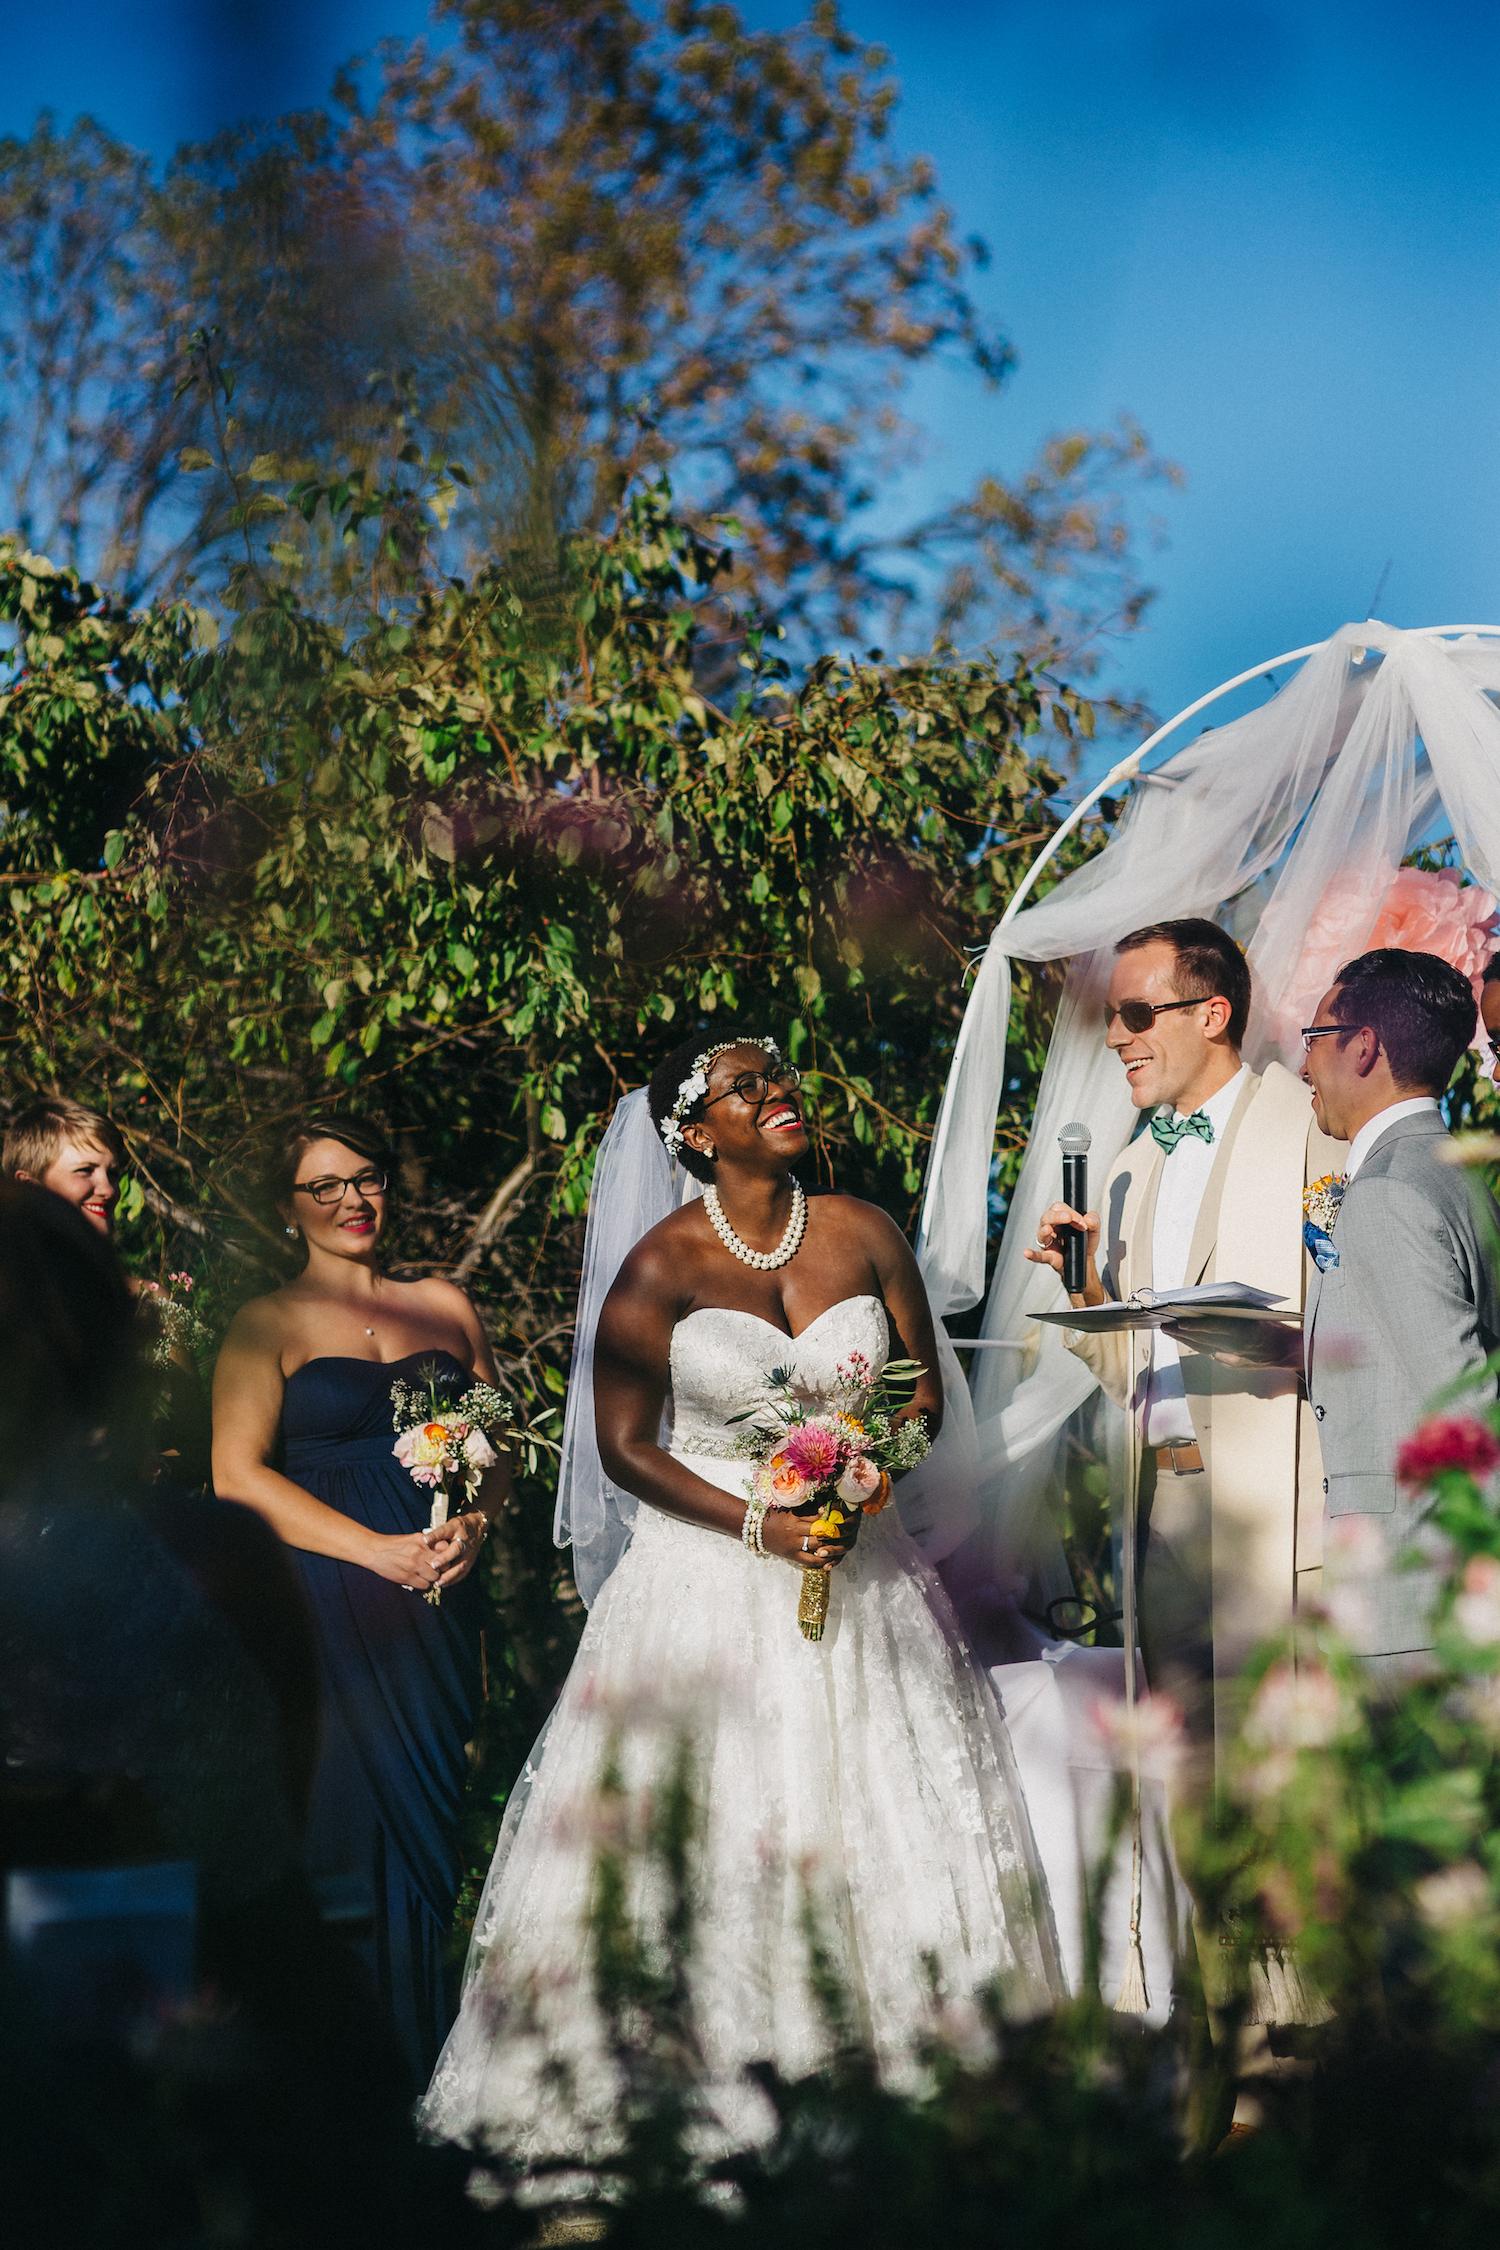 Ashlei & Derrick wedding 0518.jpg